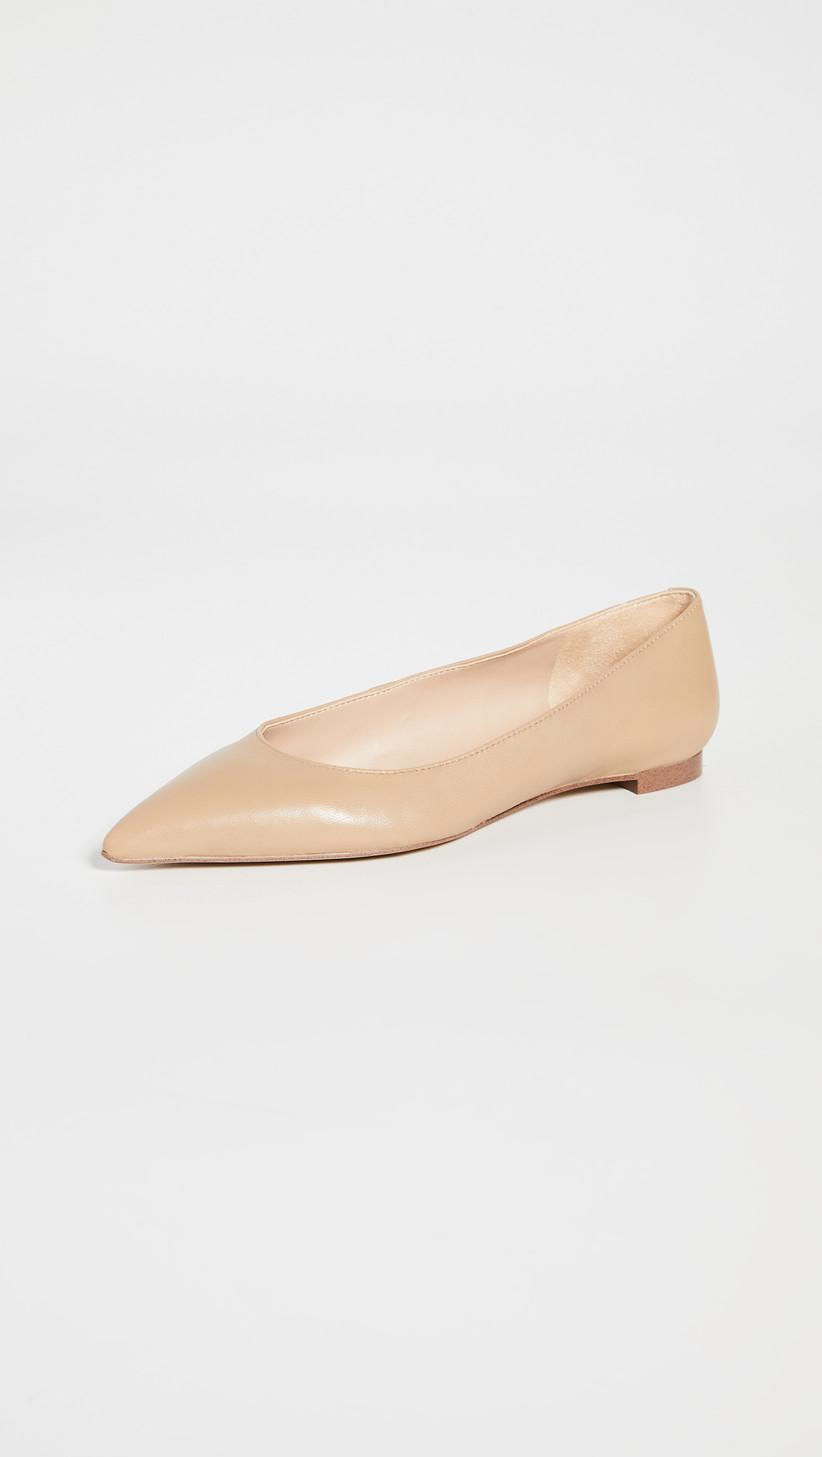 Wedding Guest Shoes ballet flats